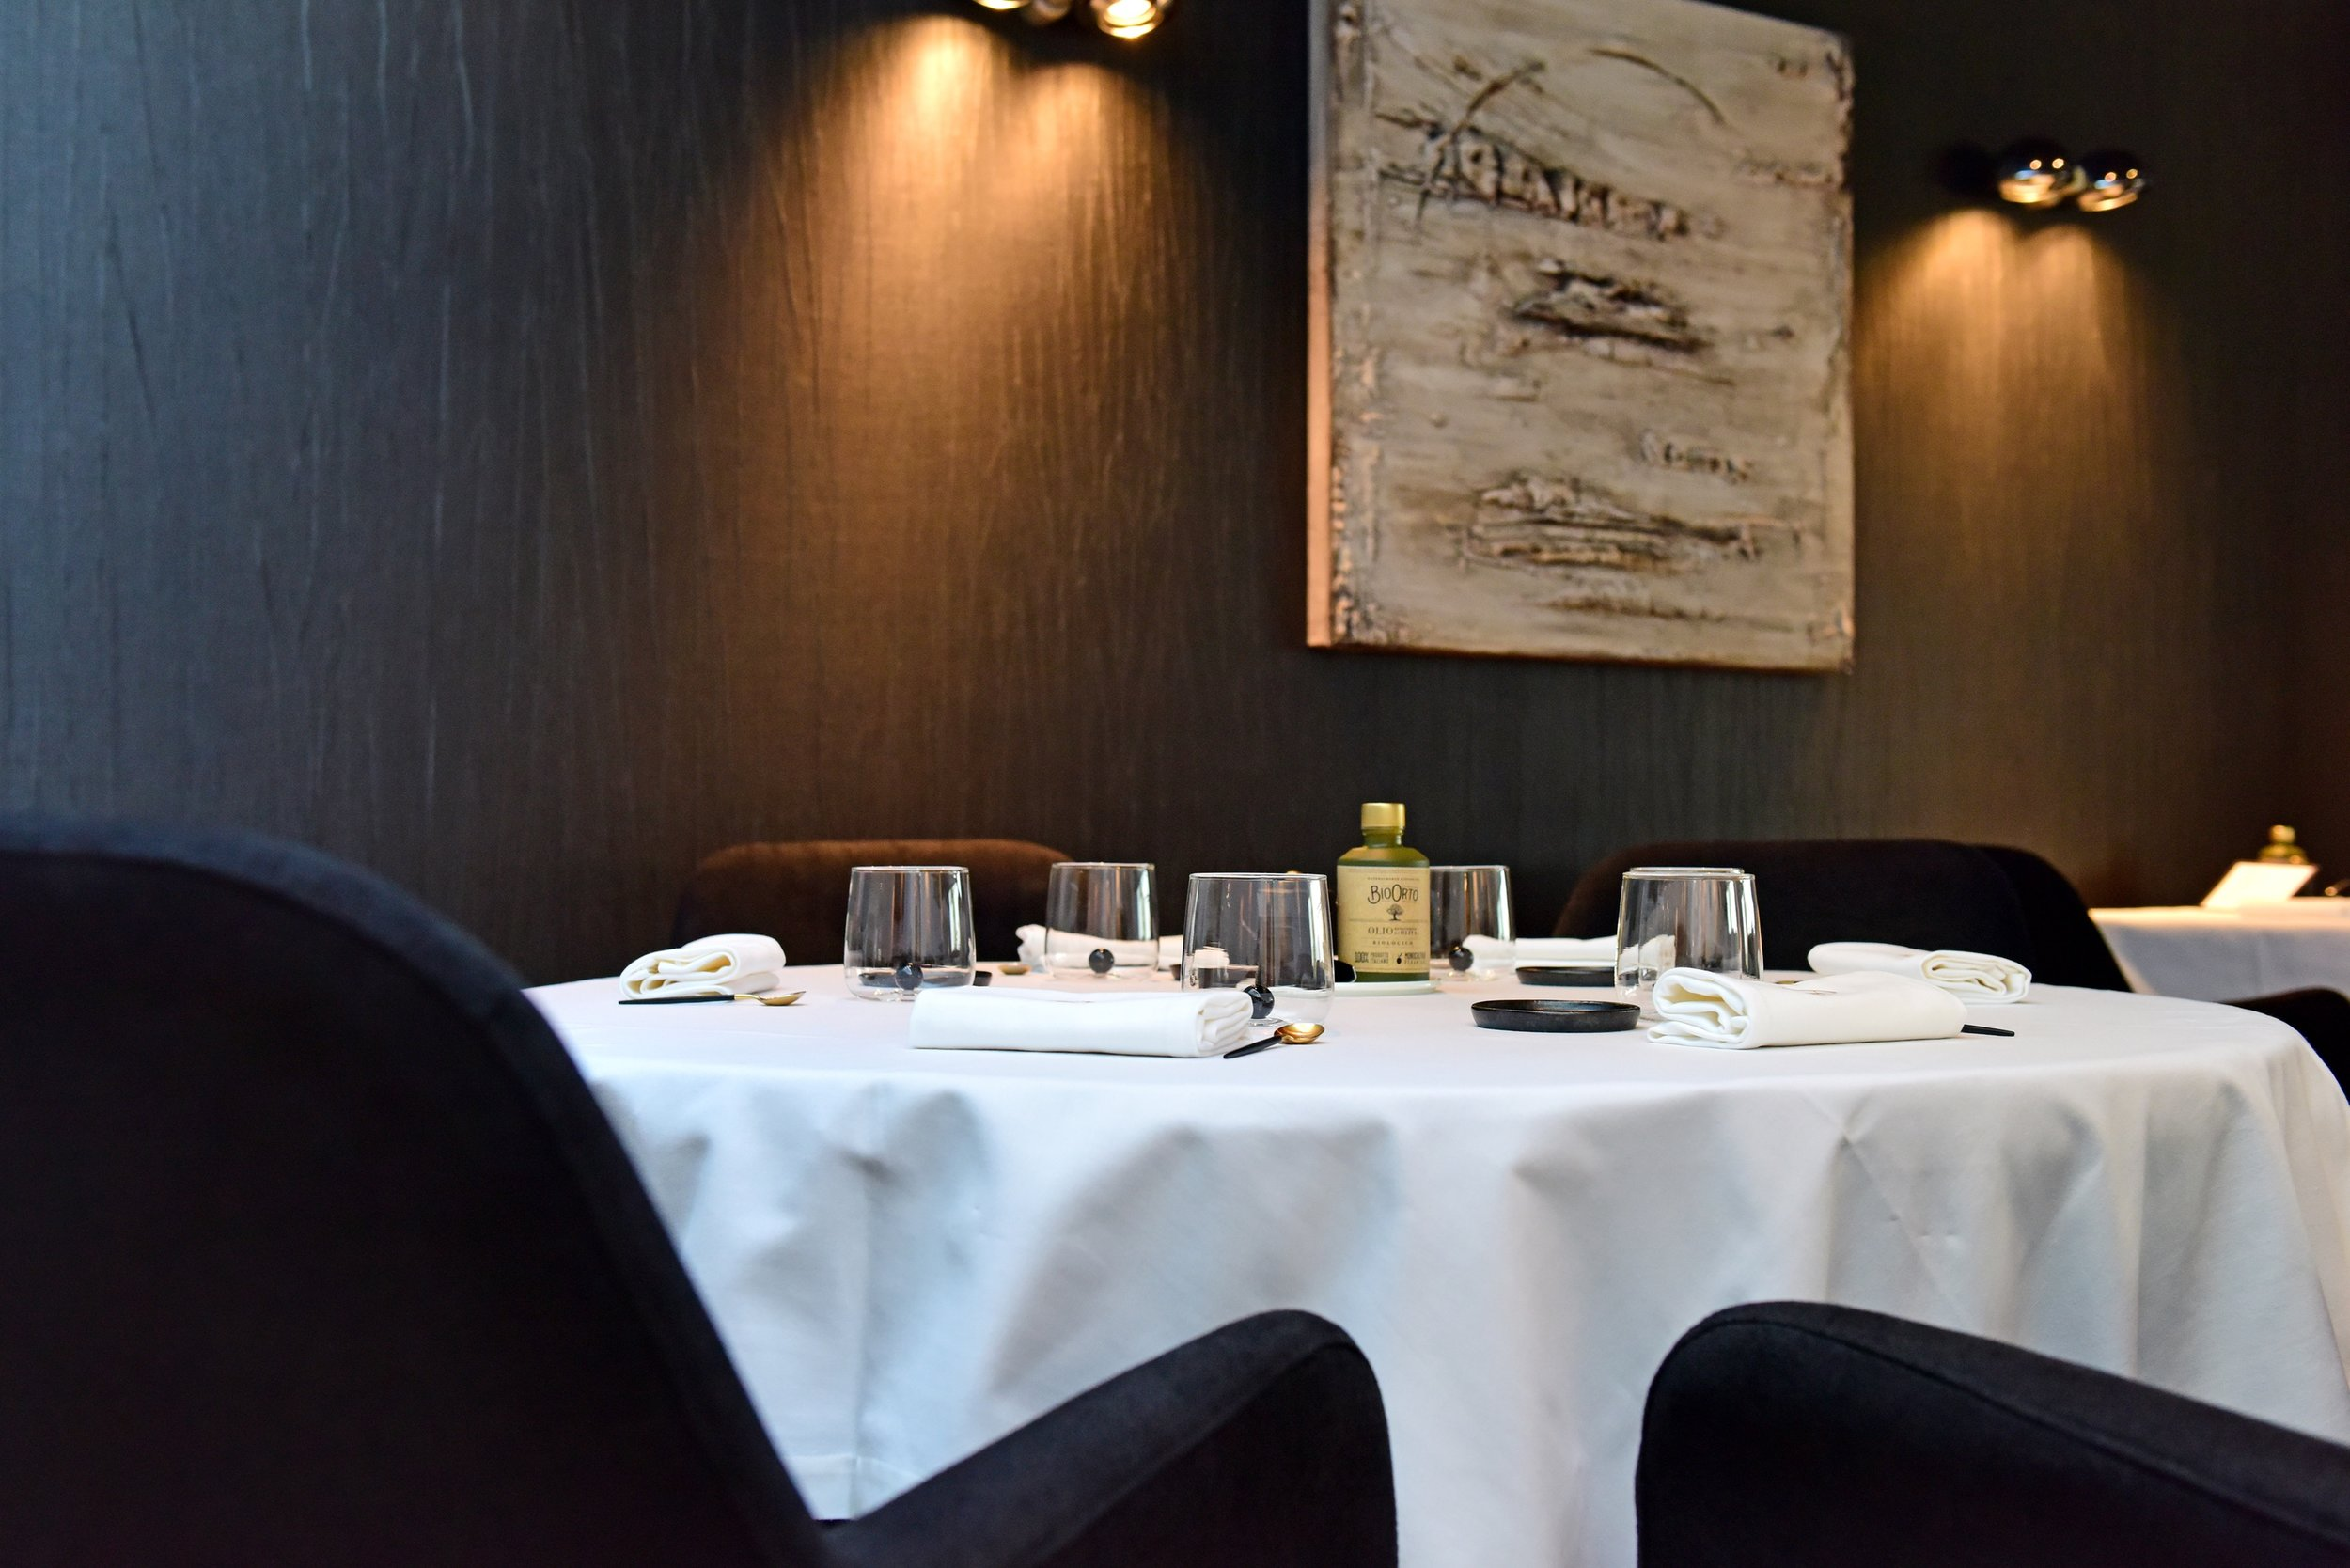 19 restaurant de bakermat ninove tablefever bart albrecht culinair fotograaf.jpg